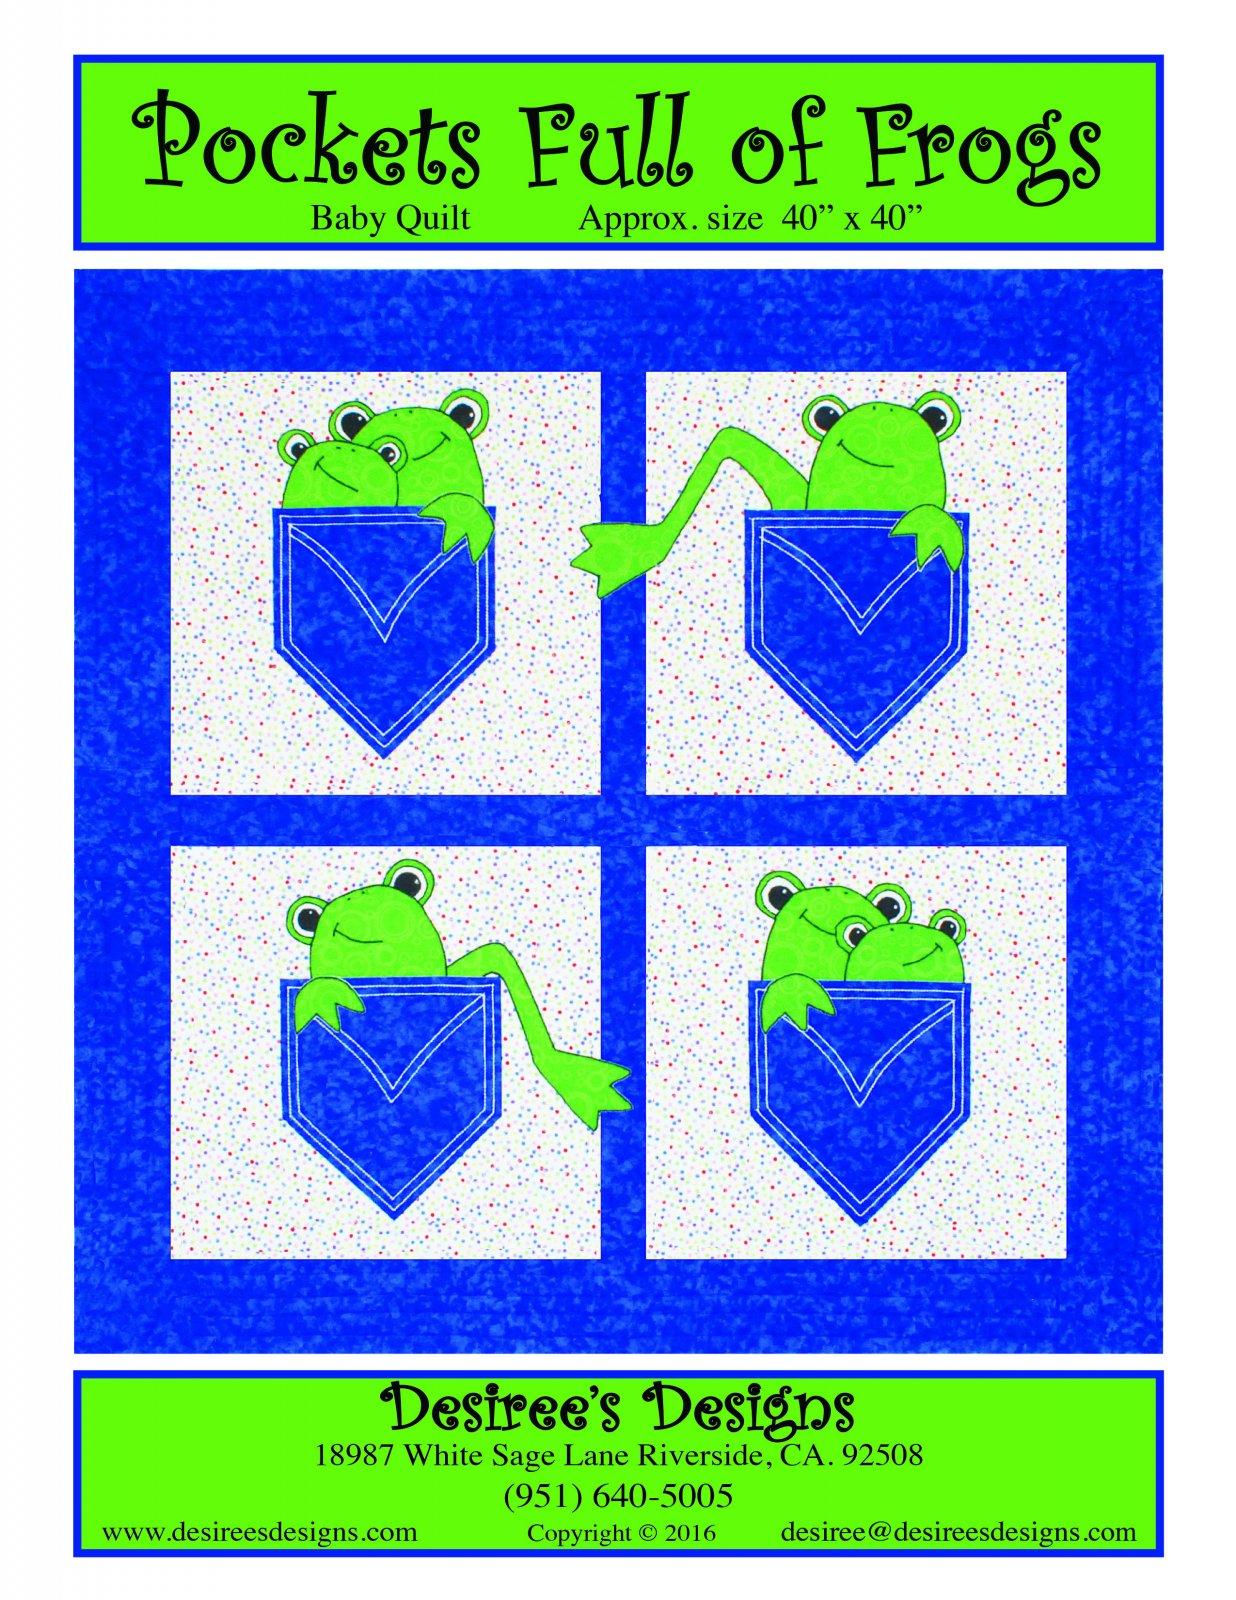 Pockets Full of Frogs E-pattern